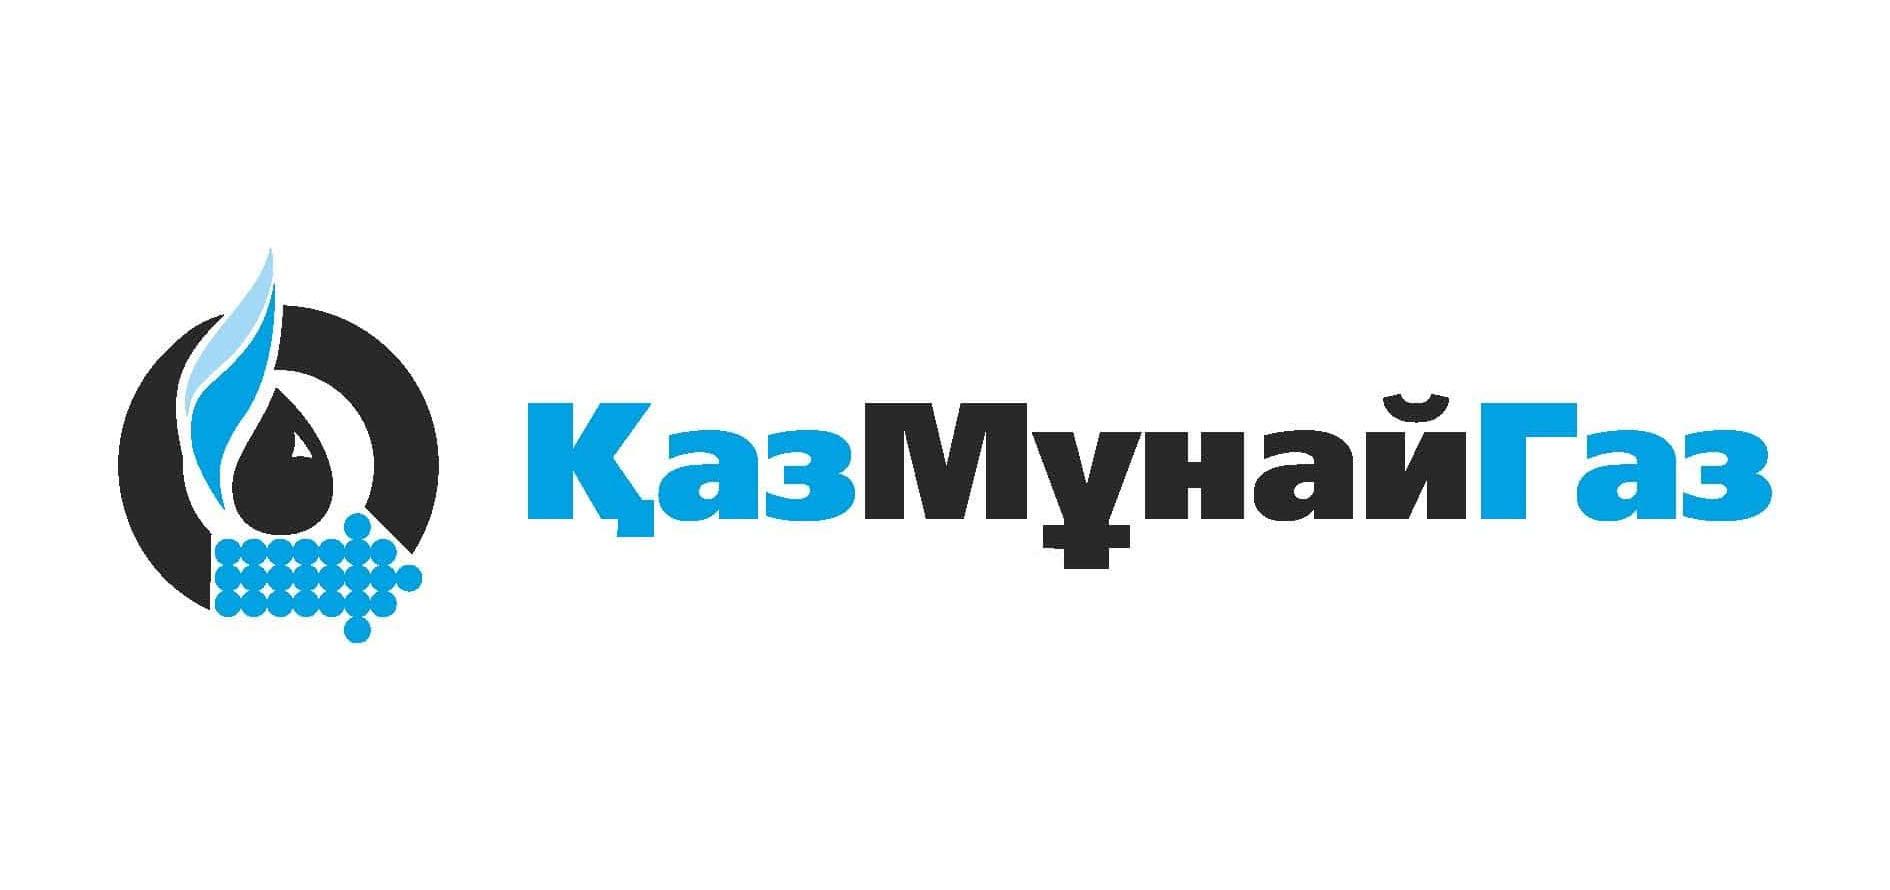 Сайт компании казмунайгаз курсы создания сайта в воронеже